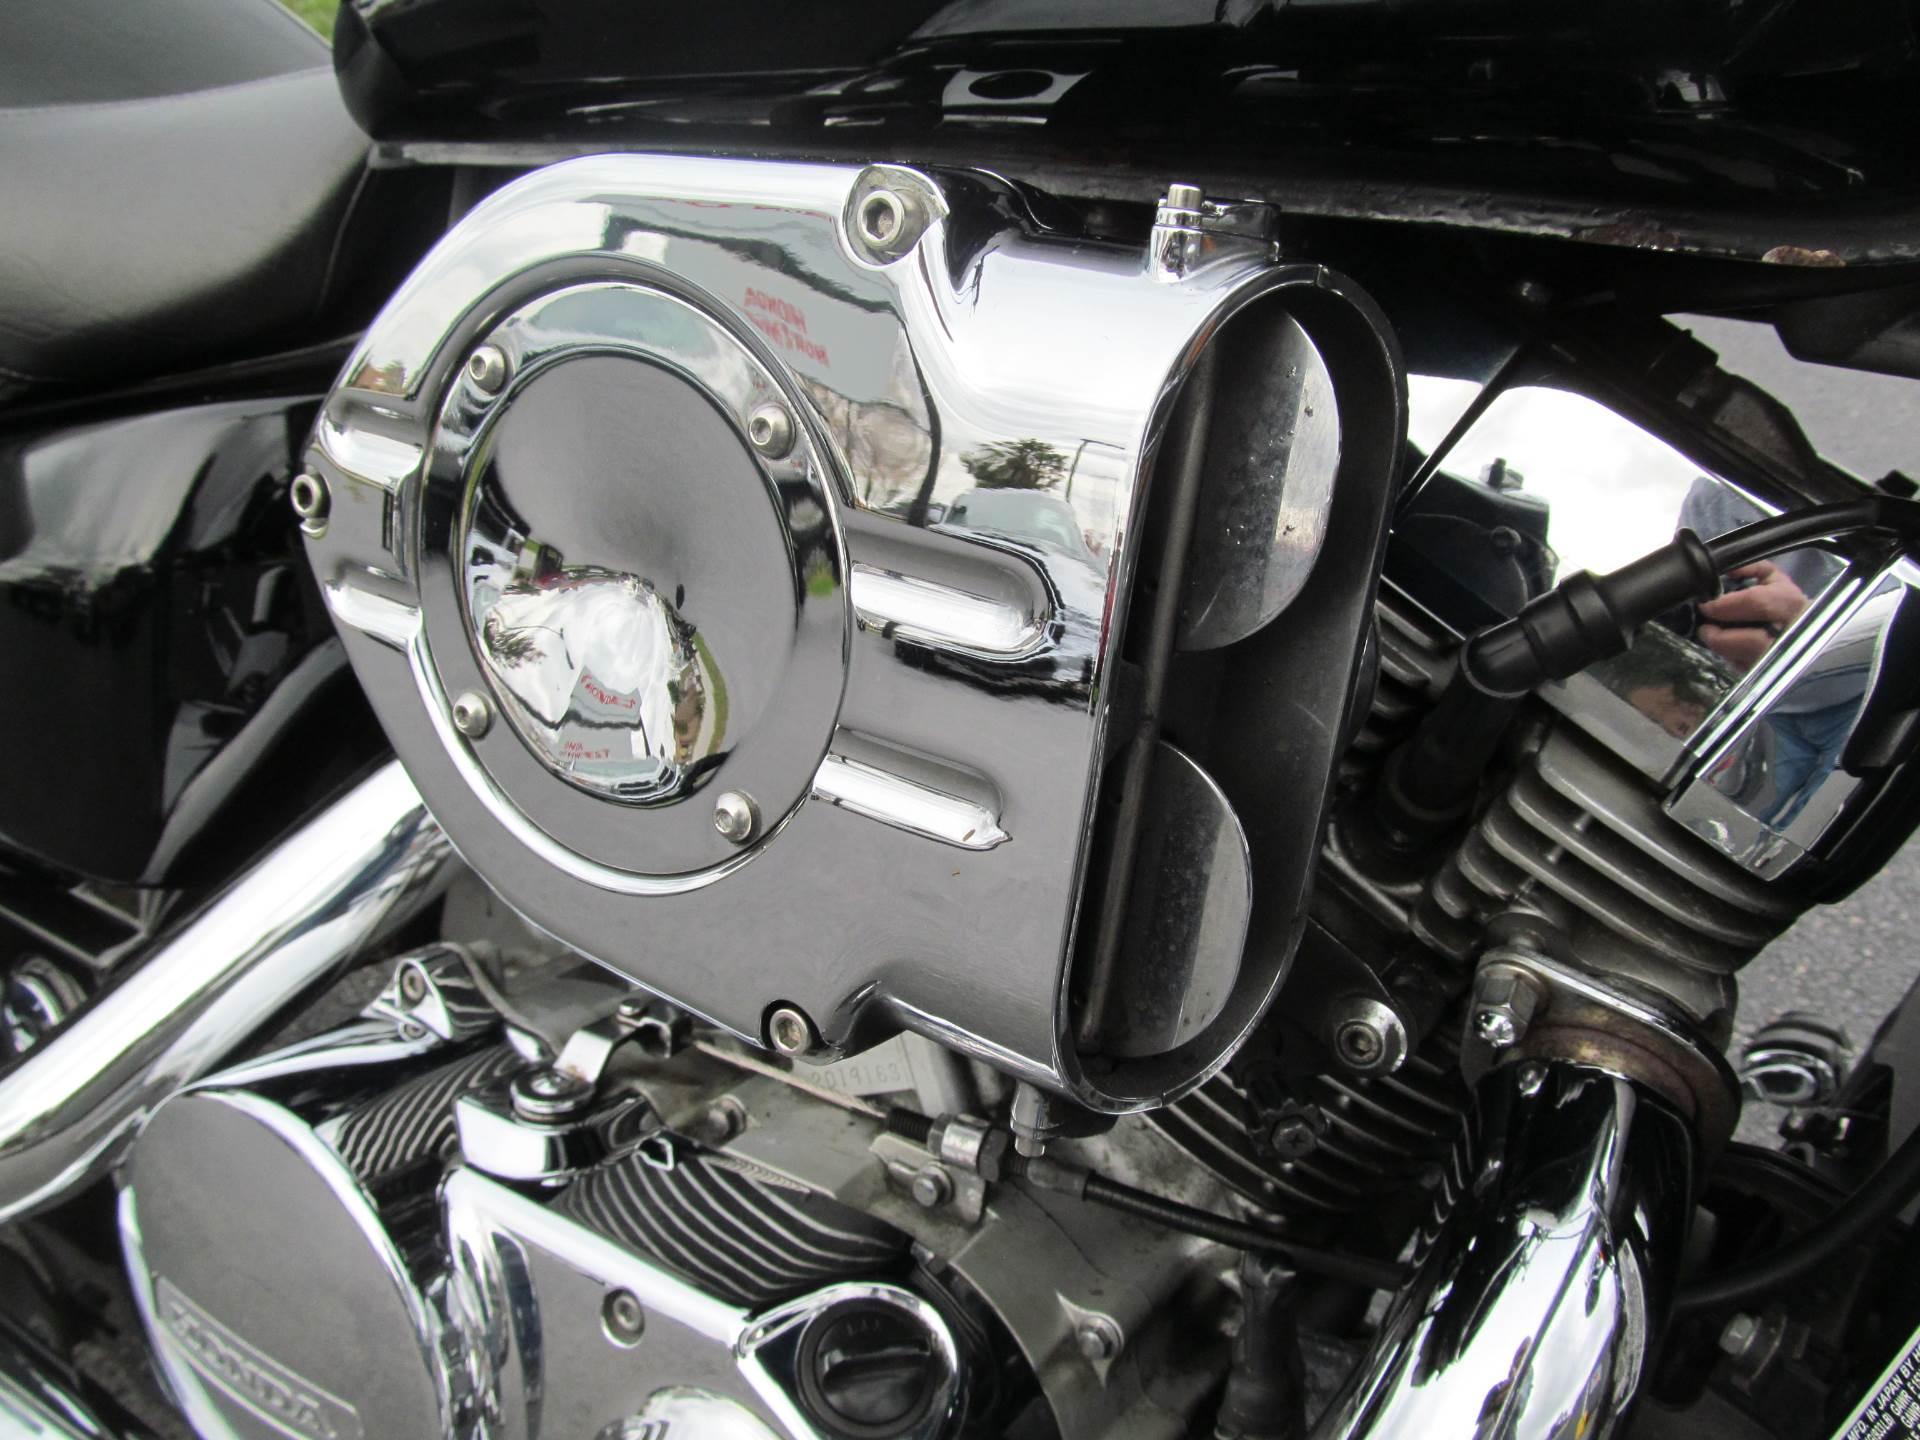 Used 2008 Honda Shadow Spirit 750 Motorcycles In Crystal Lake Il